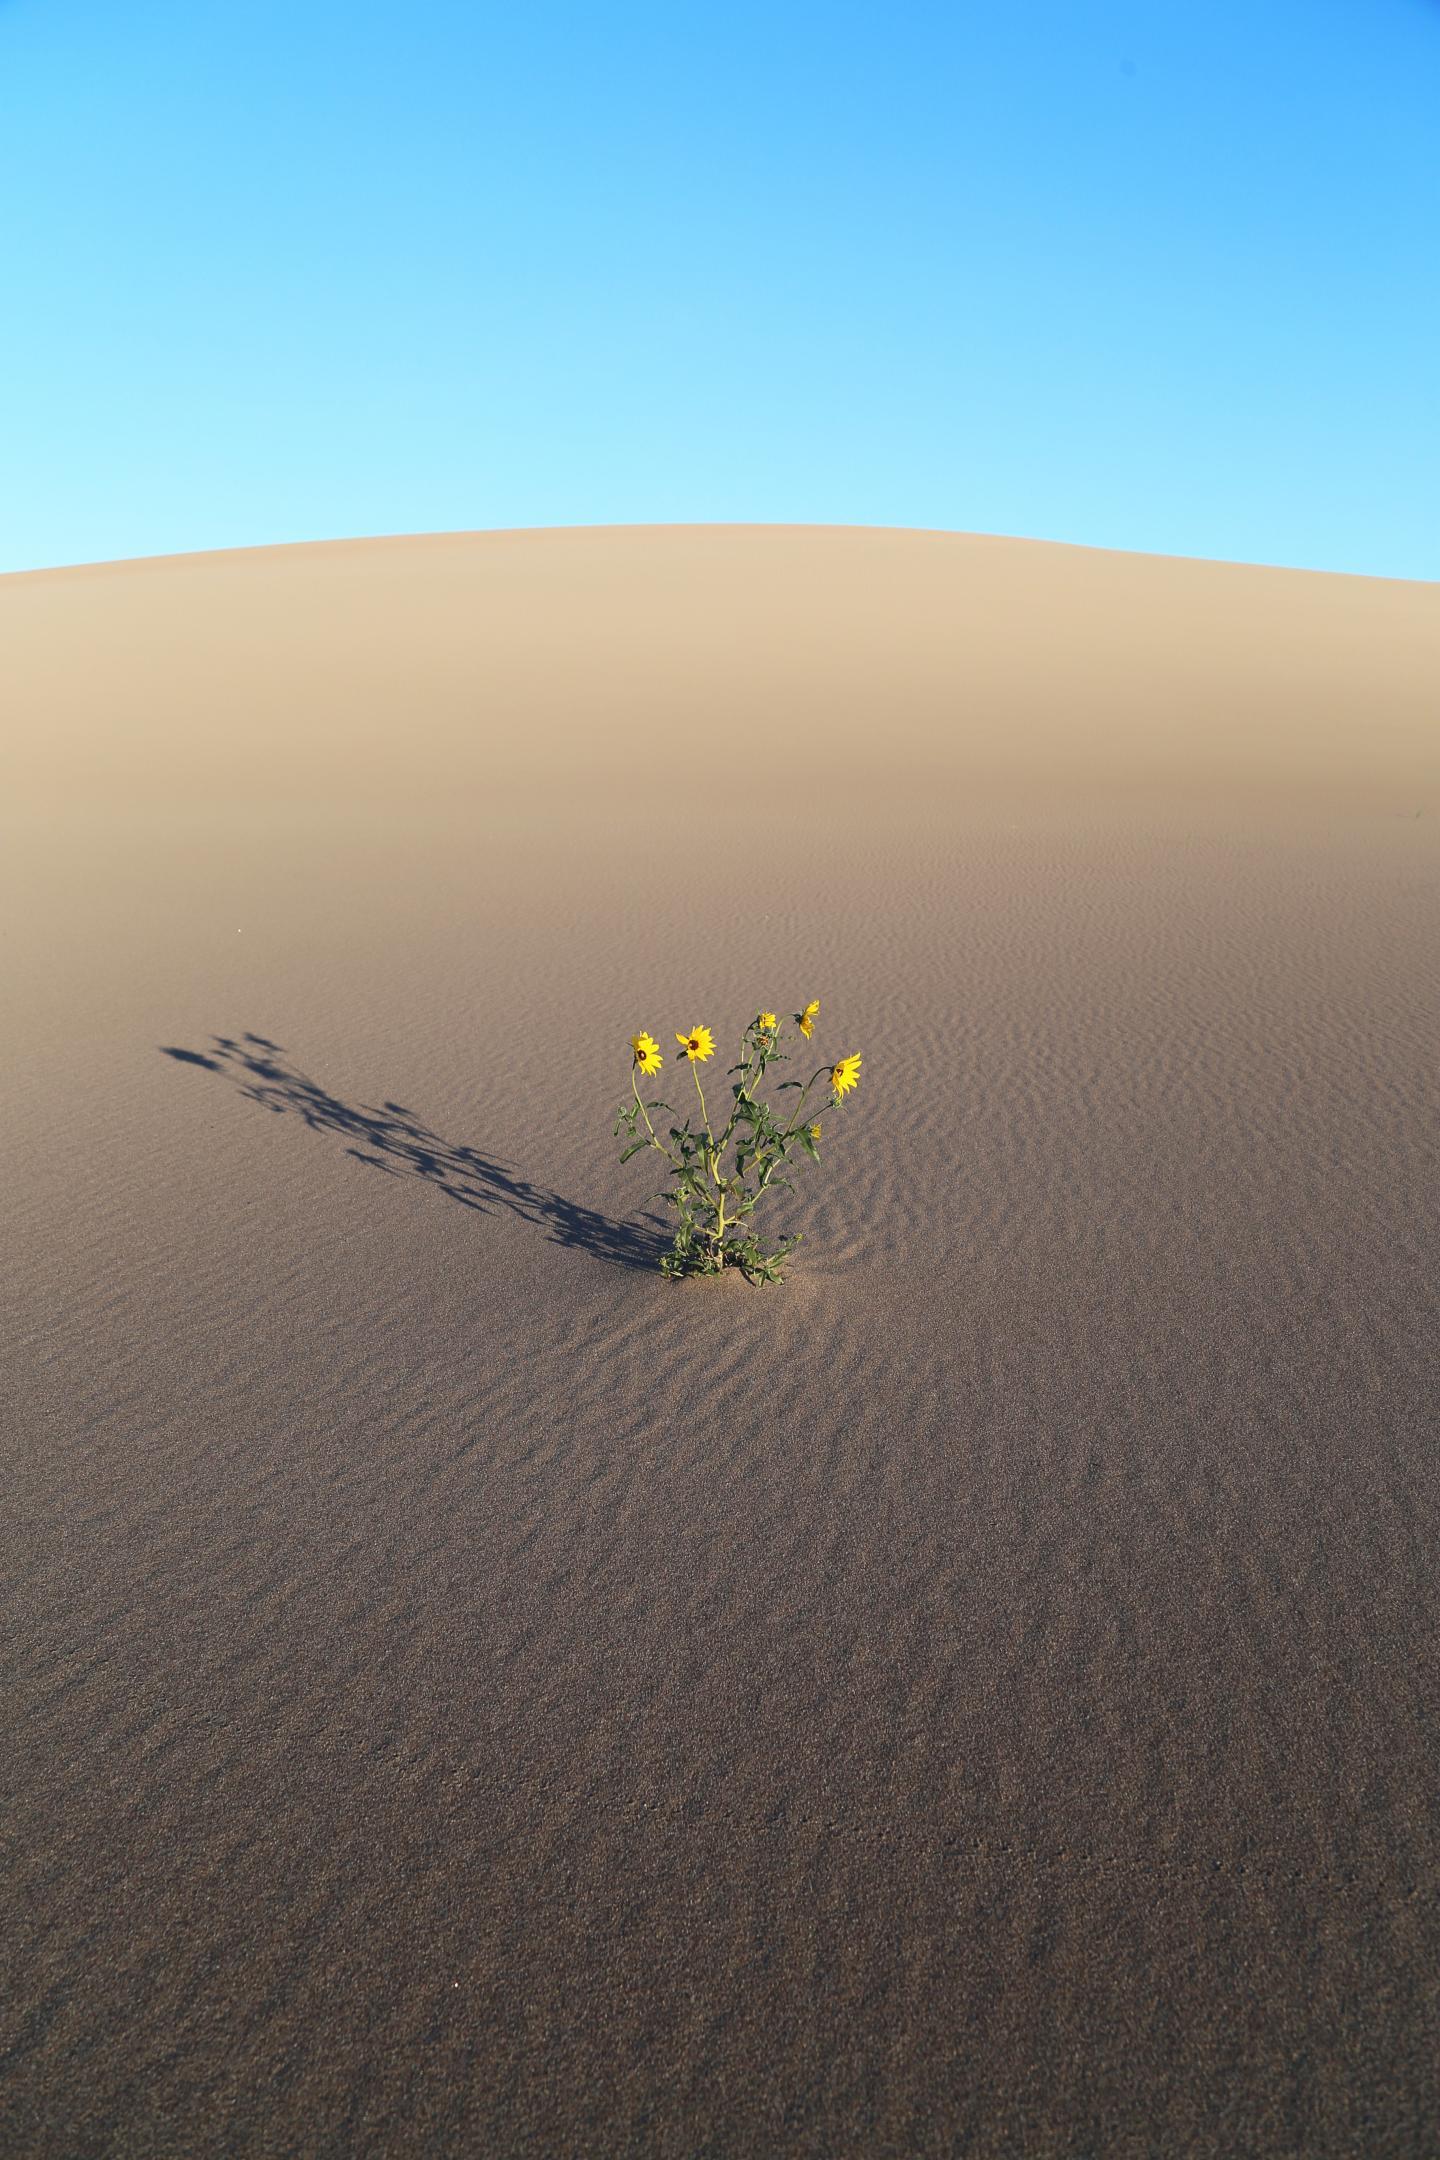 Supergenes Help Sunflowers Adapt to Harsh Environments